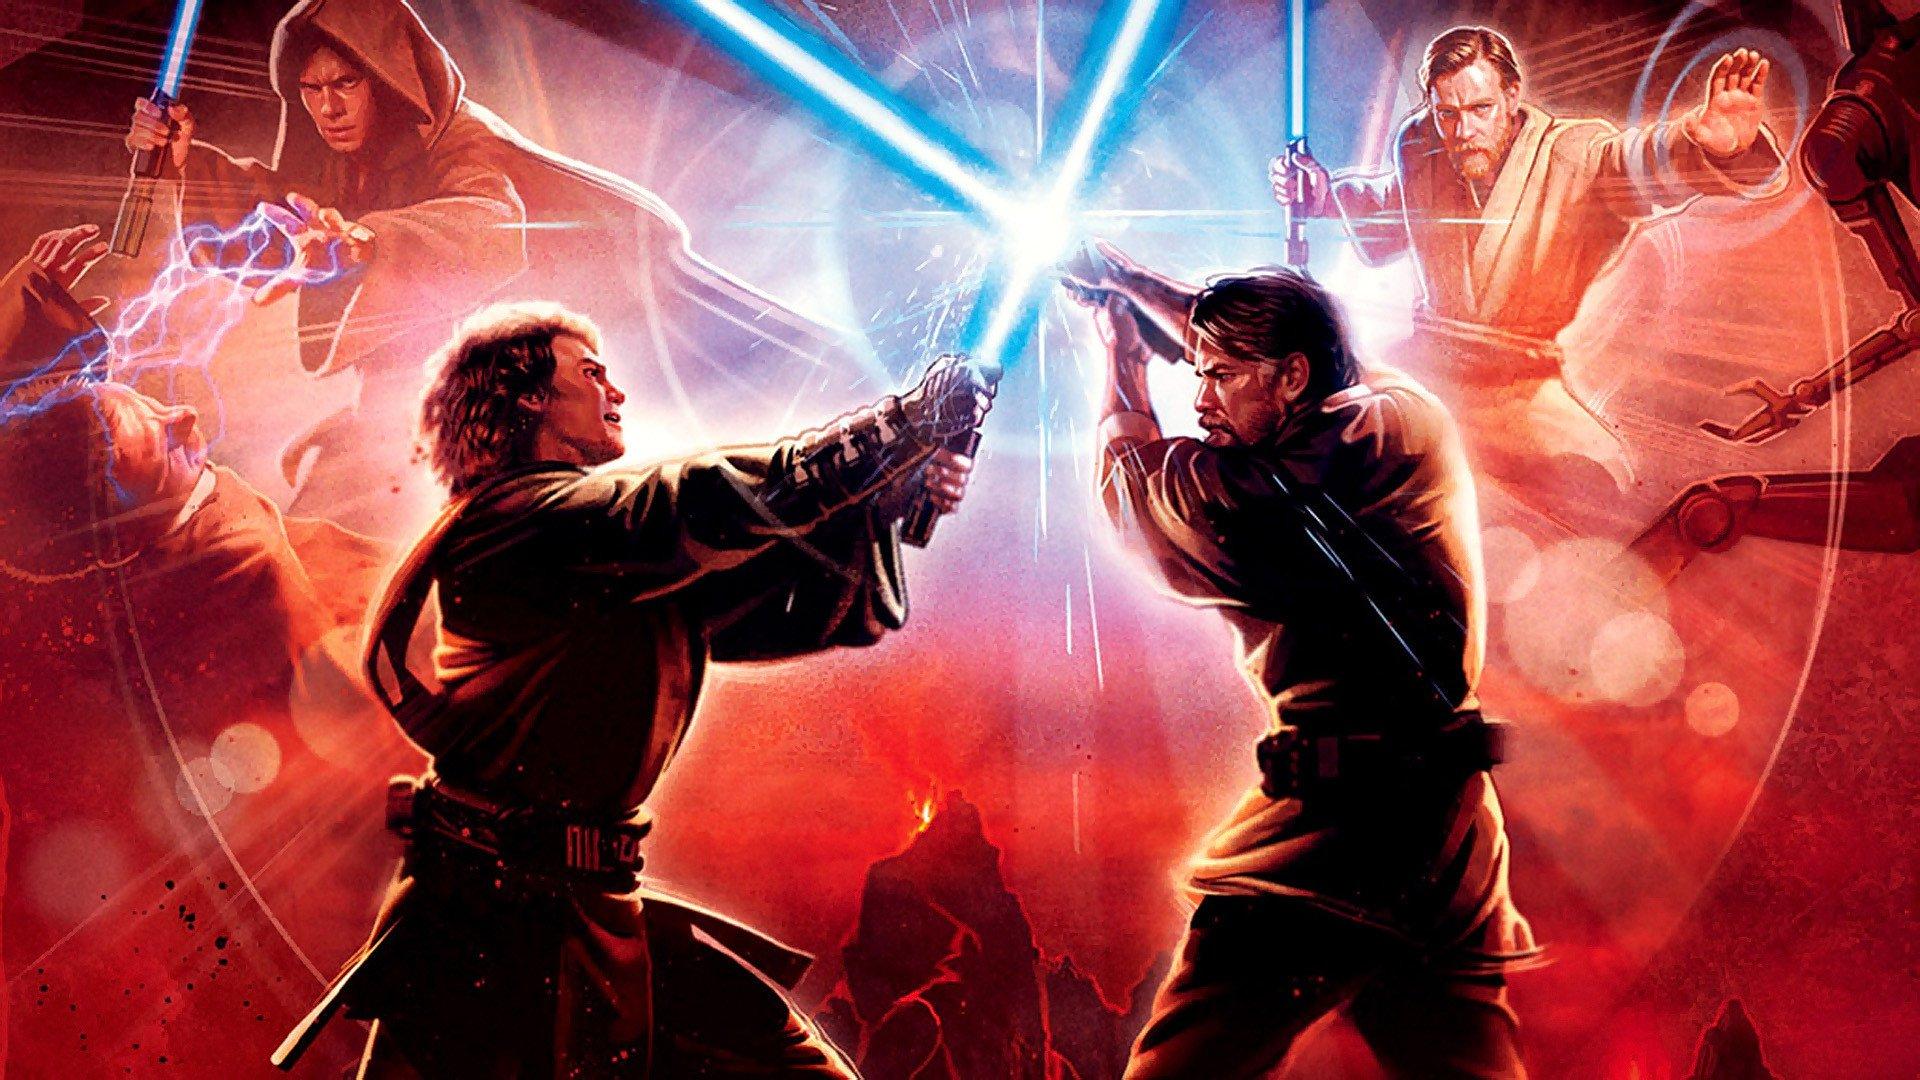 Wallpaper Star Wars III Revanche des Siths